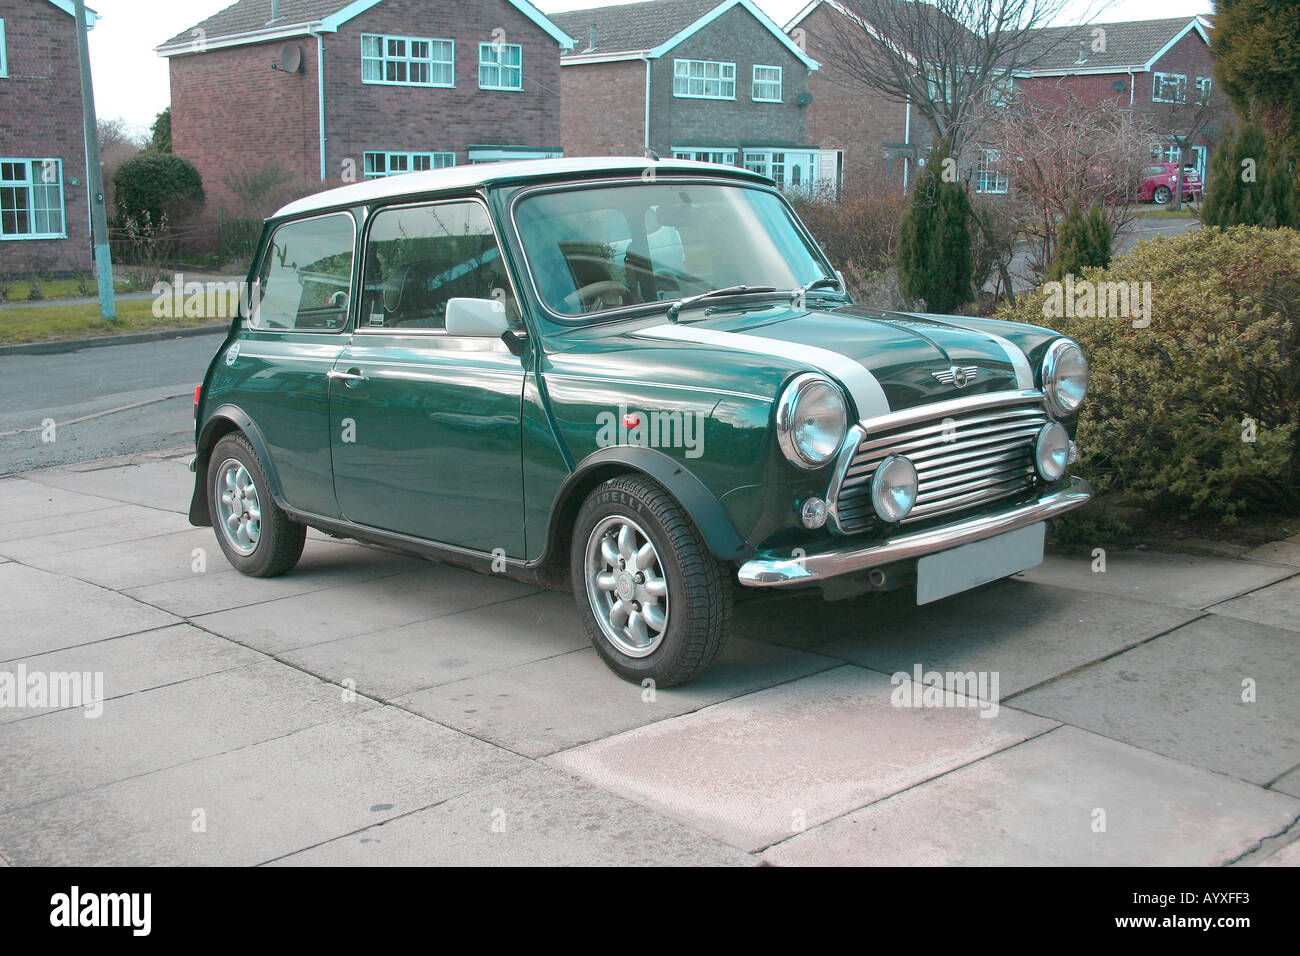 Classic British Racing Green Mini Cooper 1997 Model With 1275 Ccs